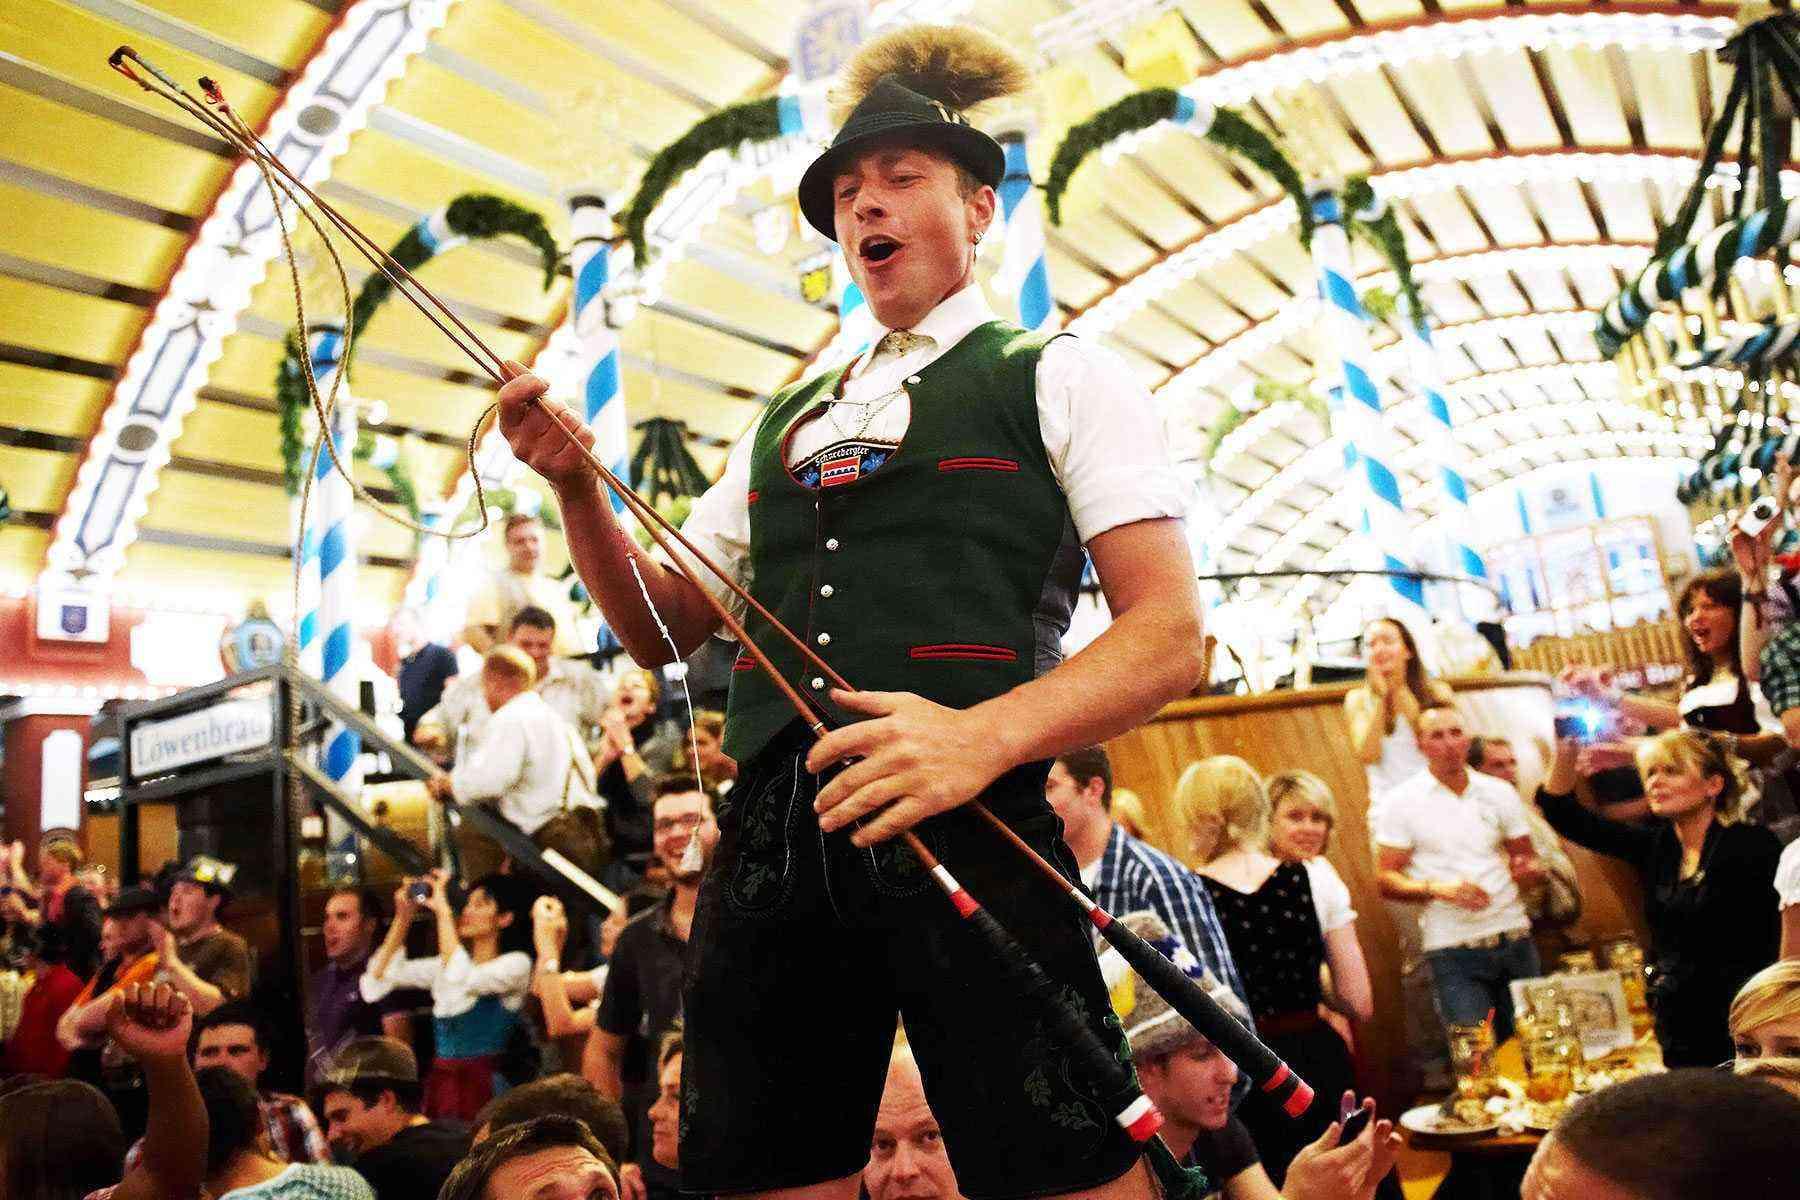 Surviving-Oktoberfest-Singing-21